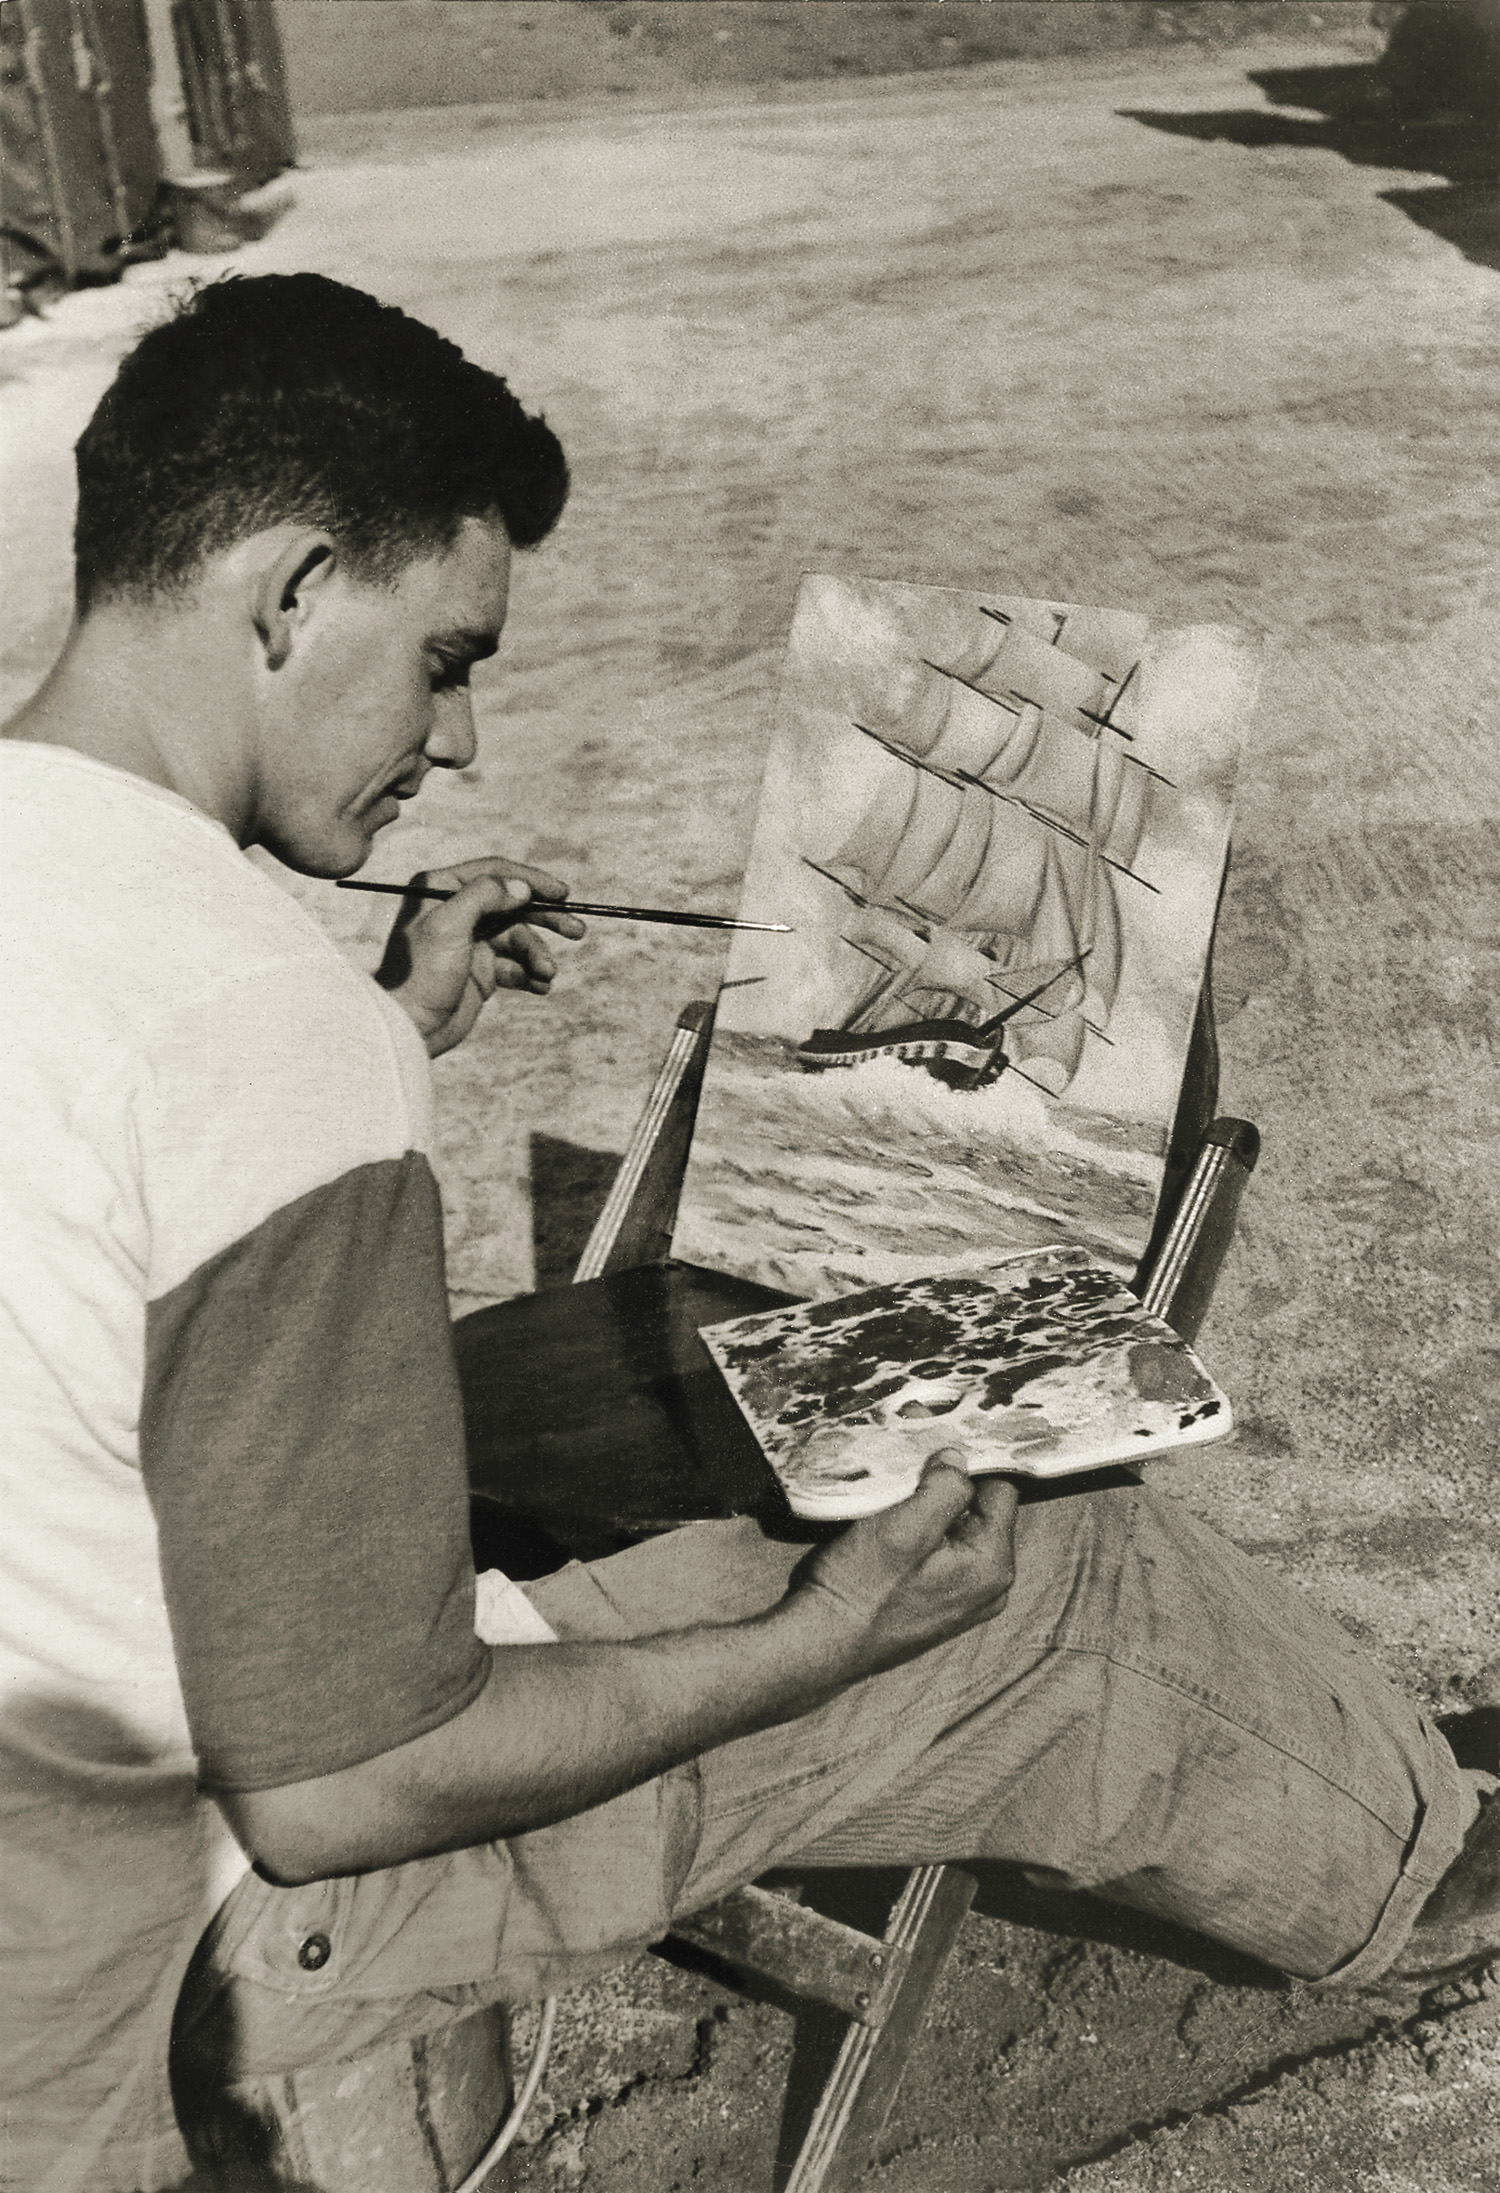 The Marine Corps, 1951